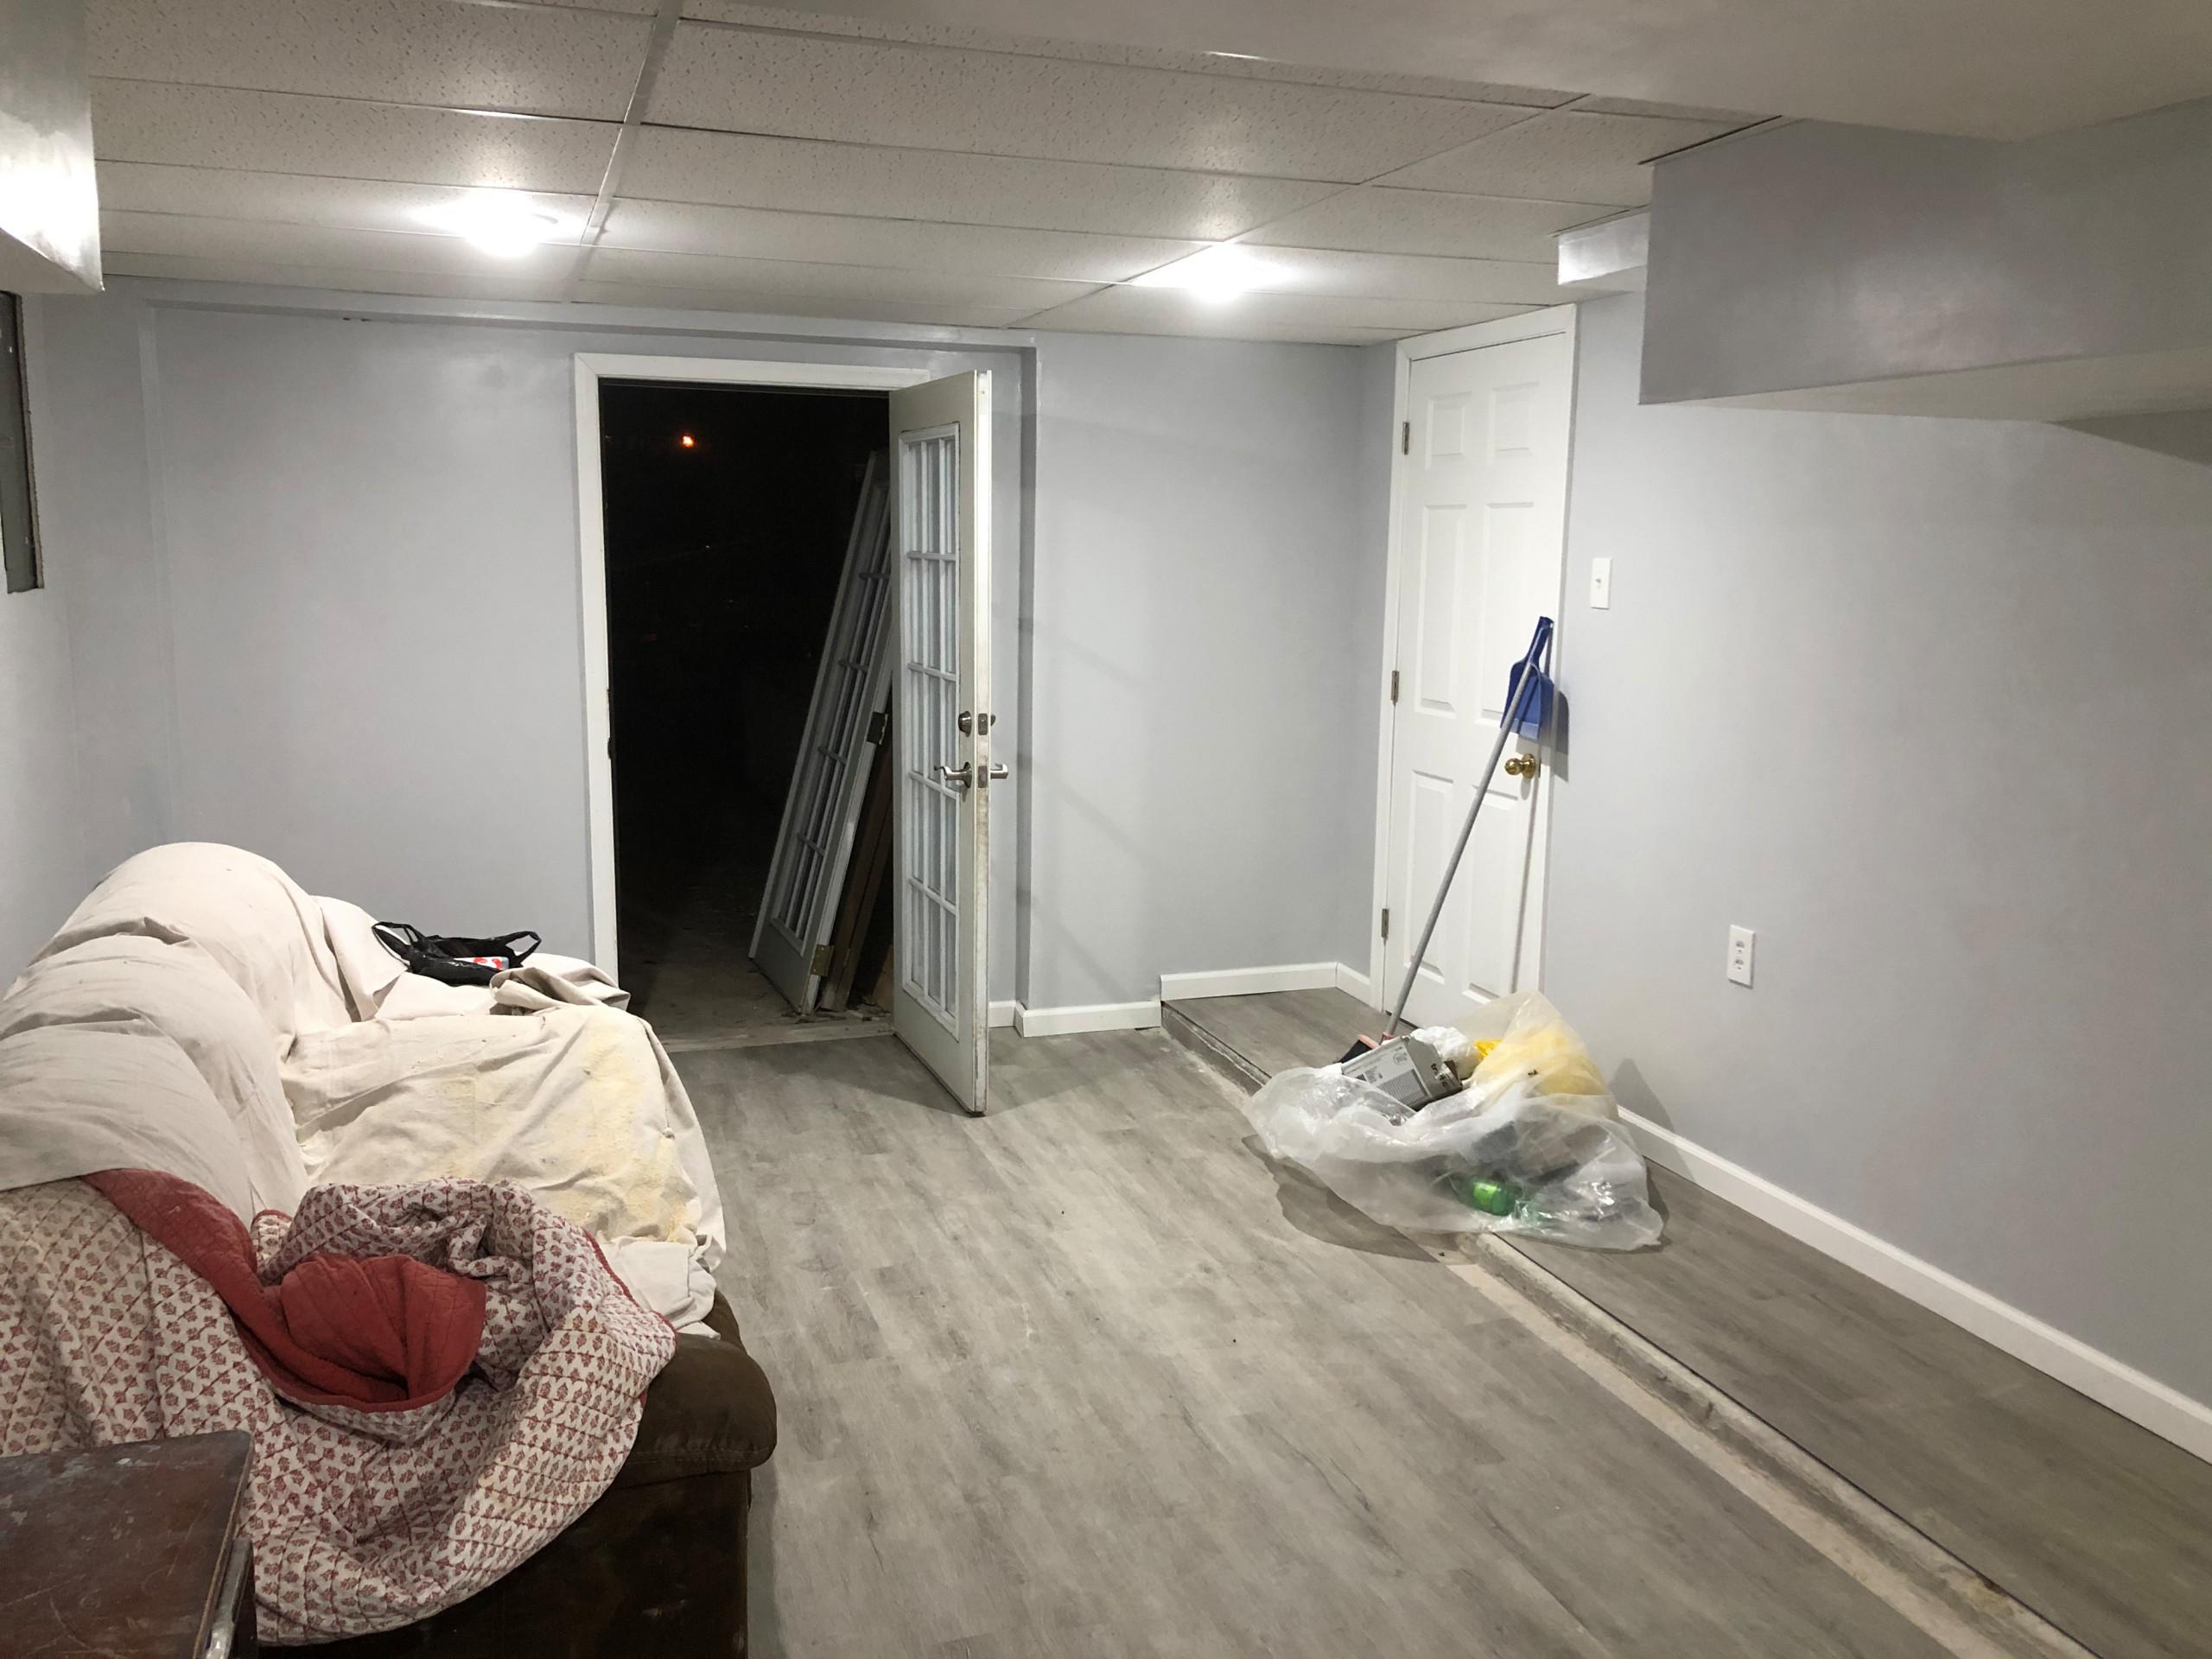 Basement Remodel Project